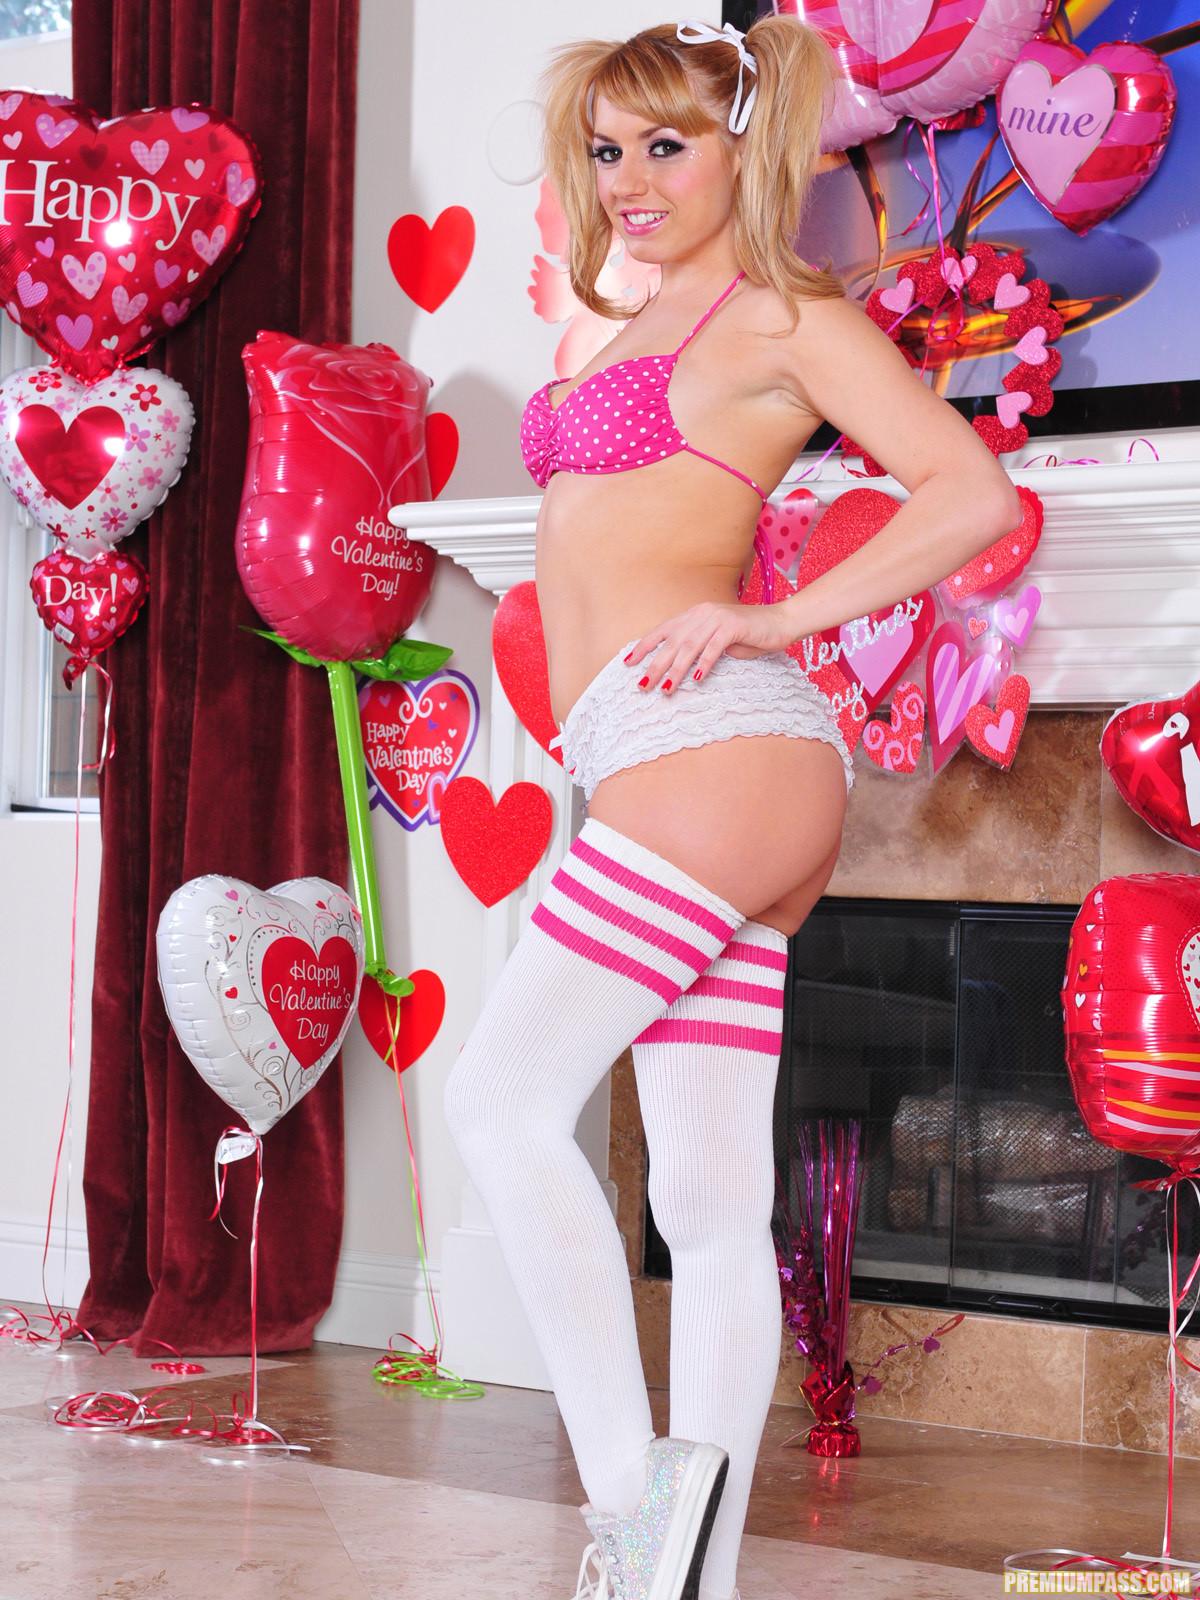 Adria rae anal valentines day secret sextape 3